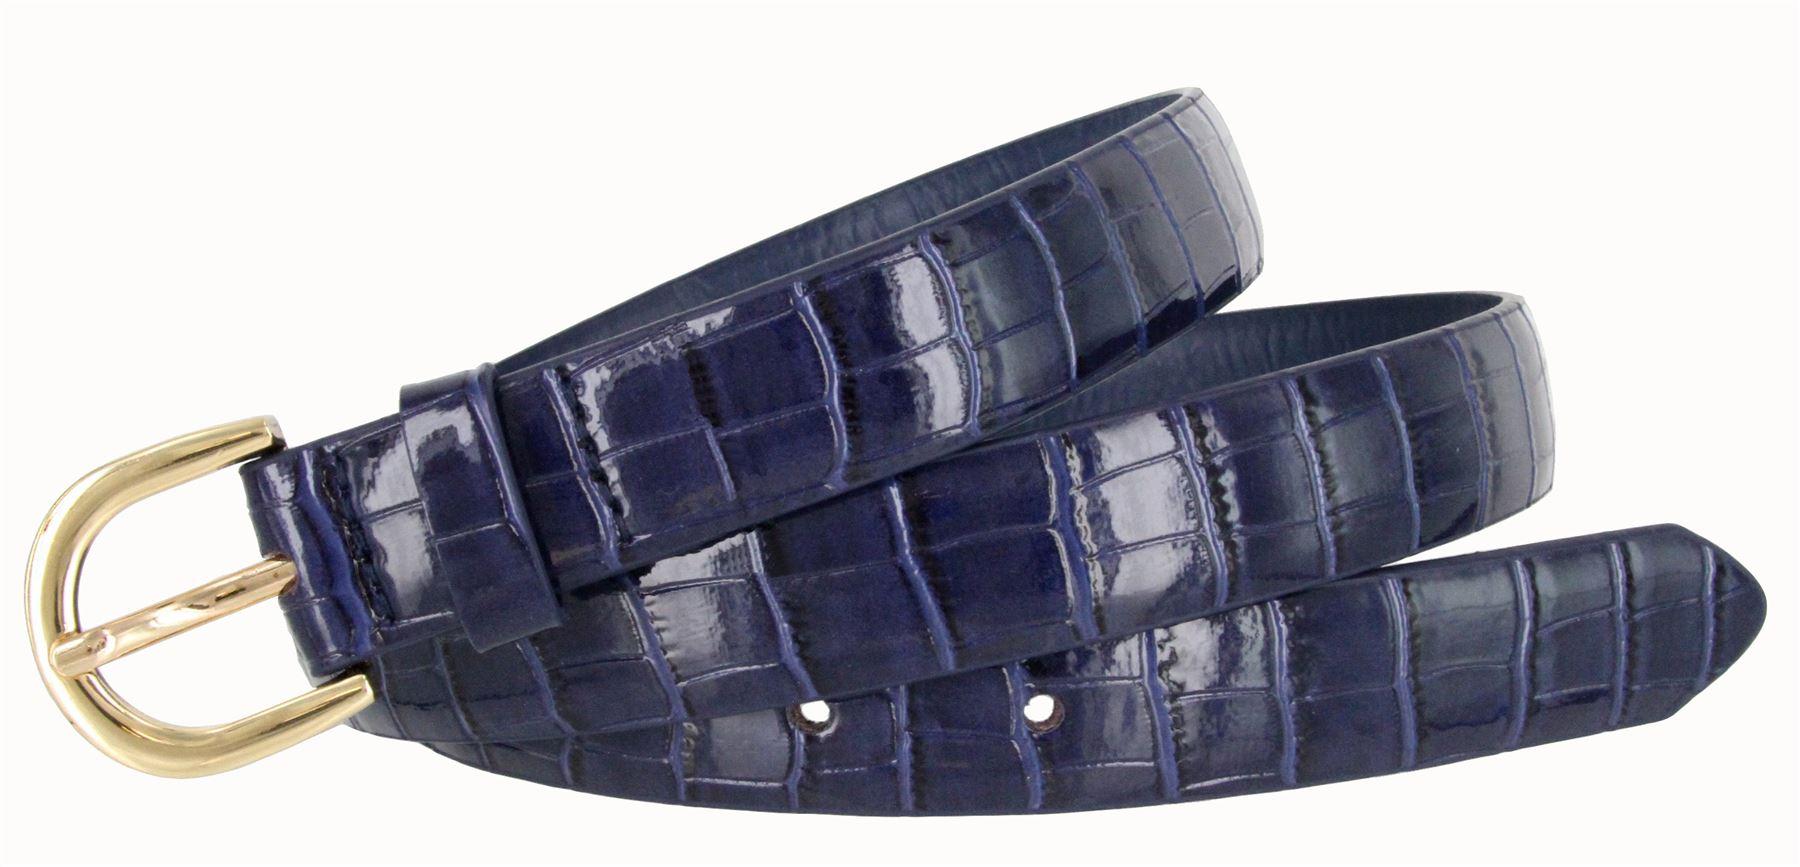 Women-039-s-Skinny-Thin-Alligator-Embossed-Genuine-Leather-Belt-1-034-25mm-Wide thumbnail 12